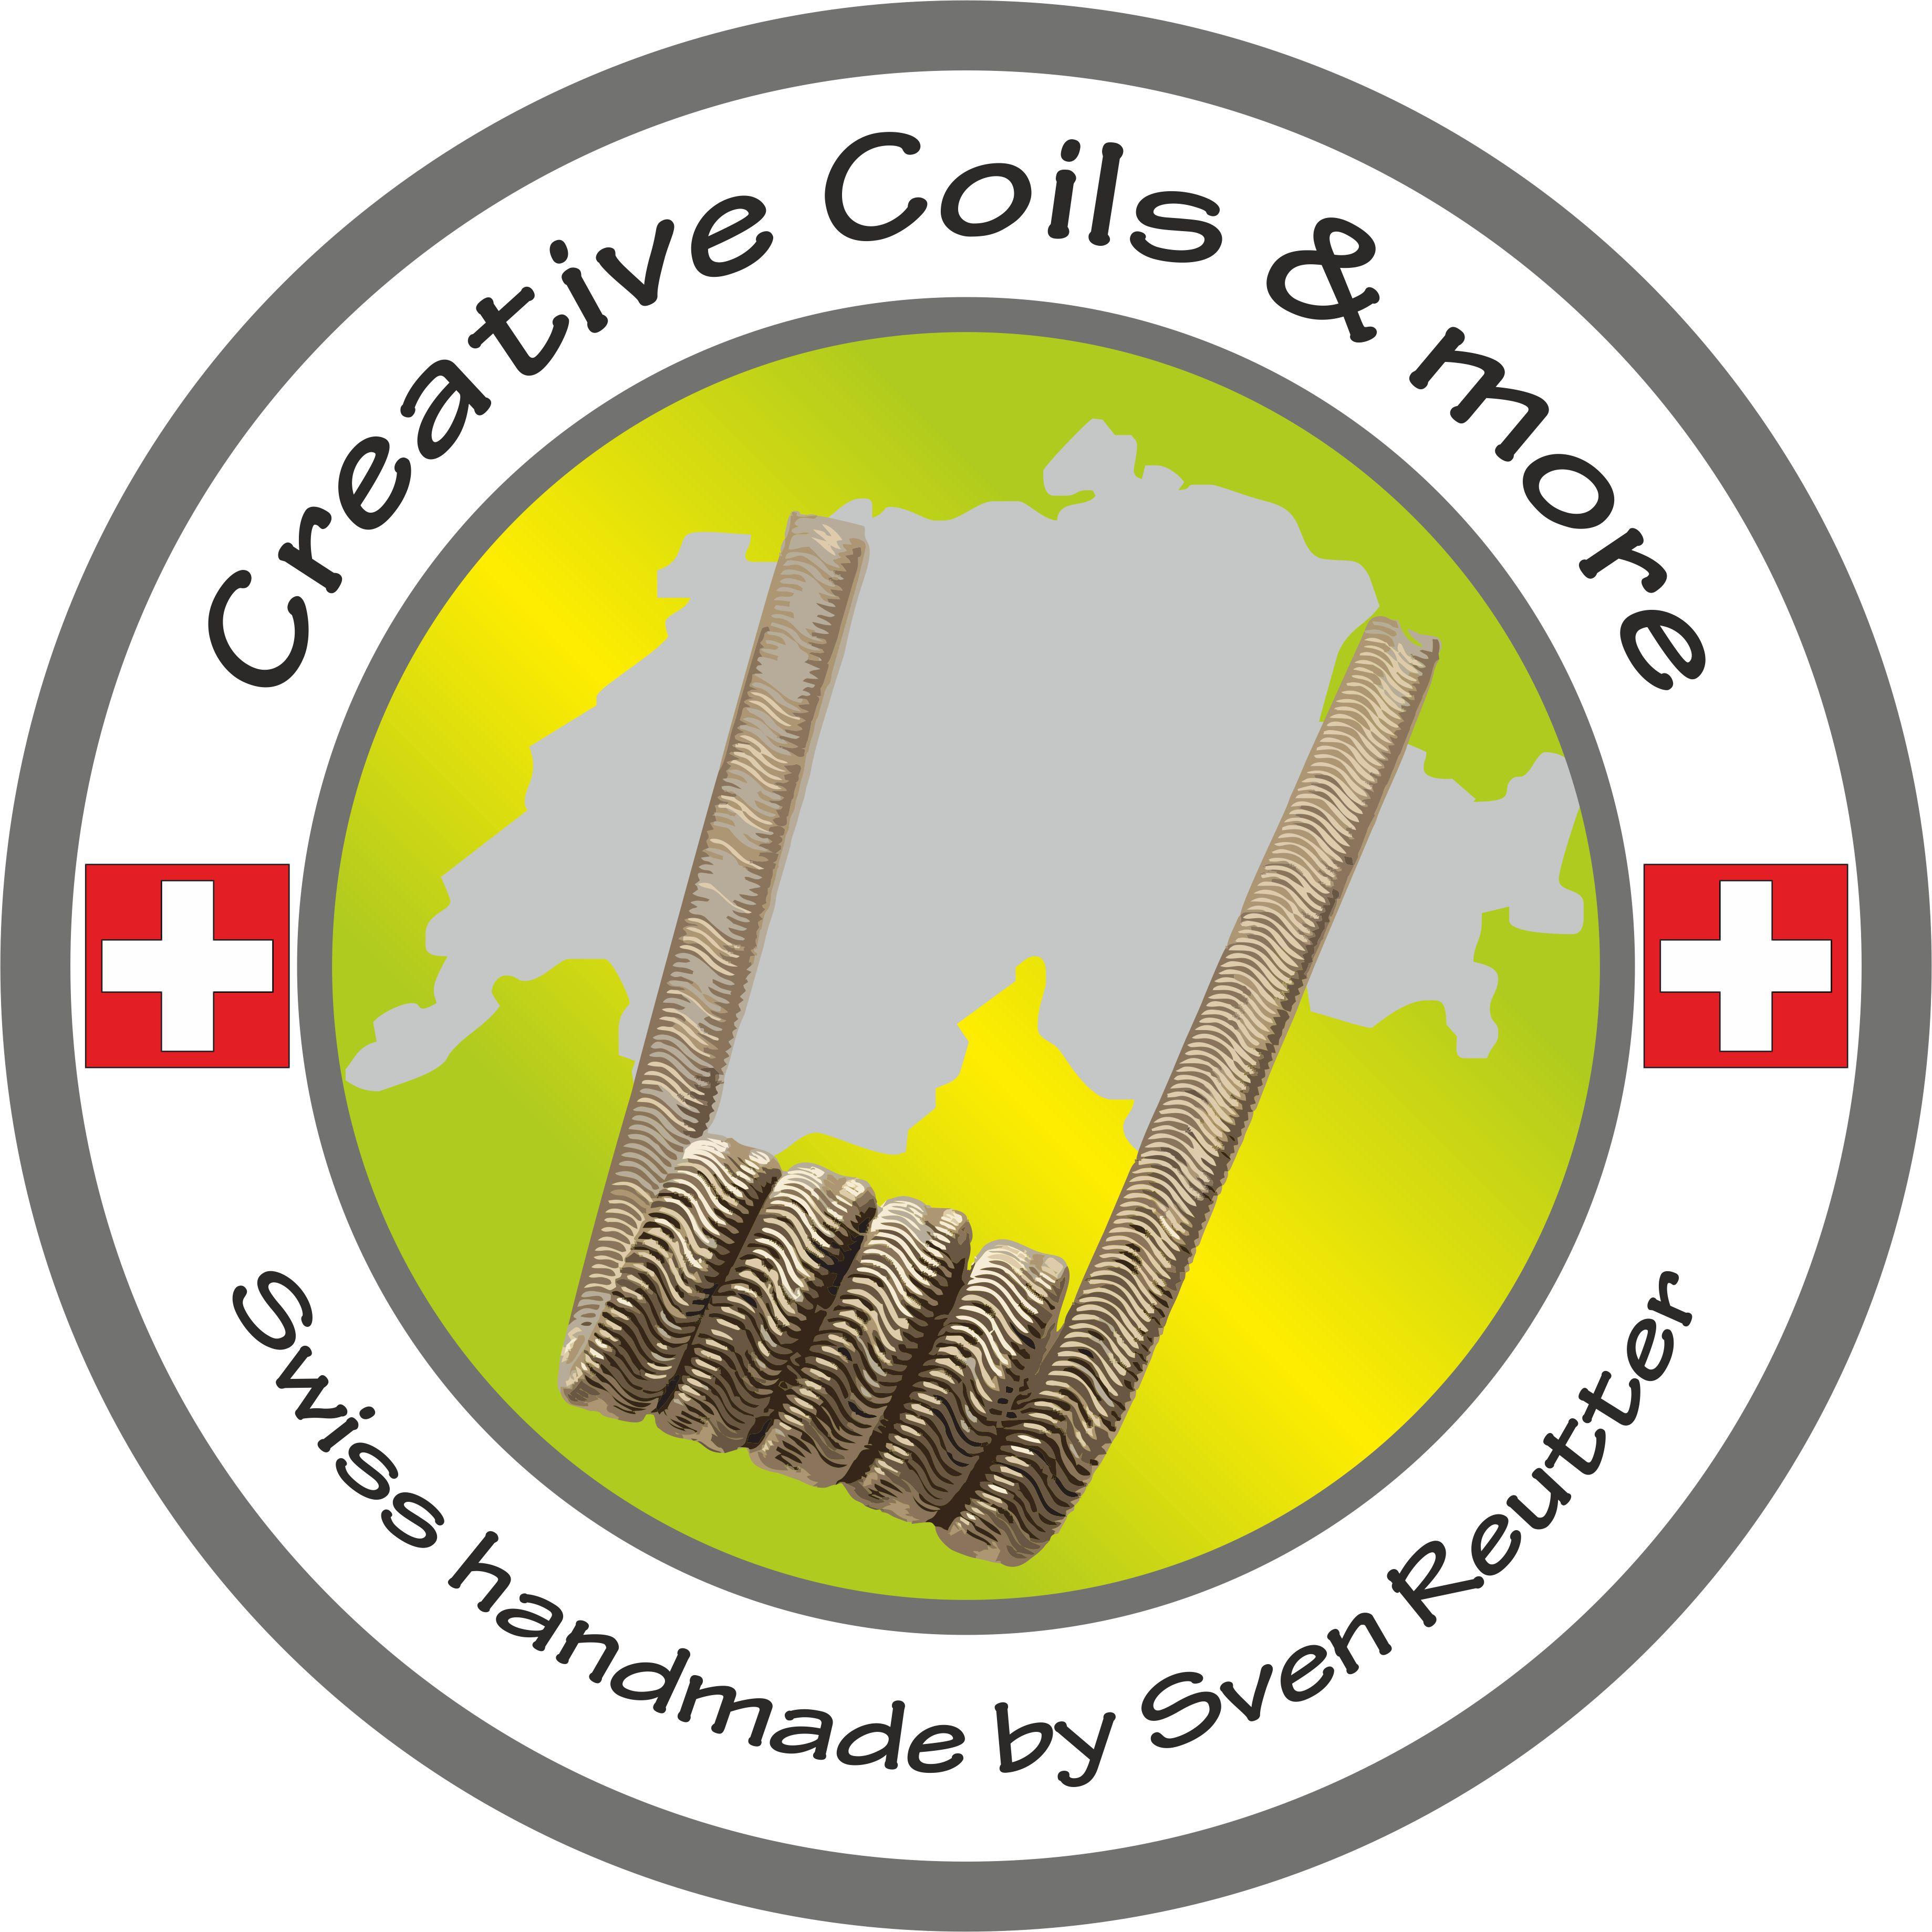 Creative Coils